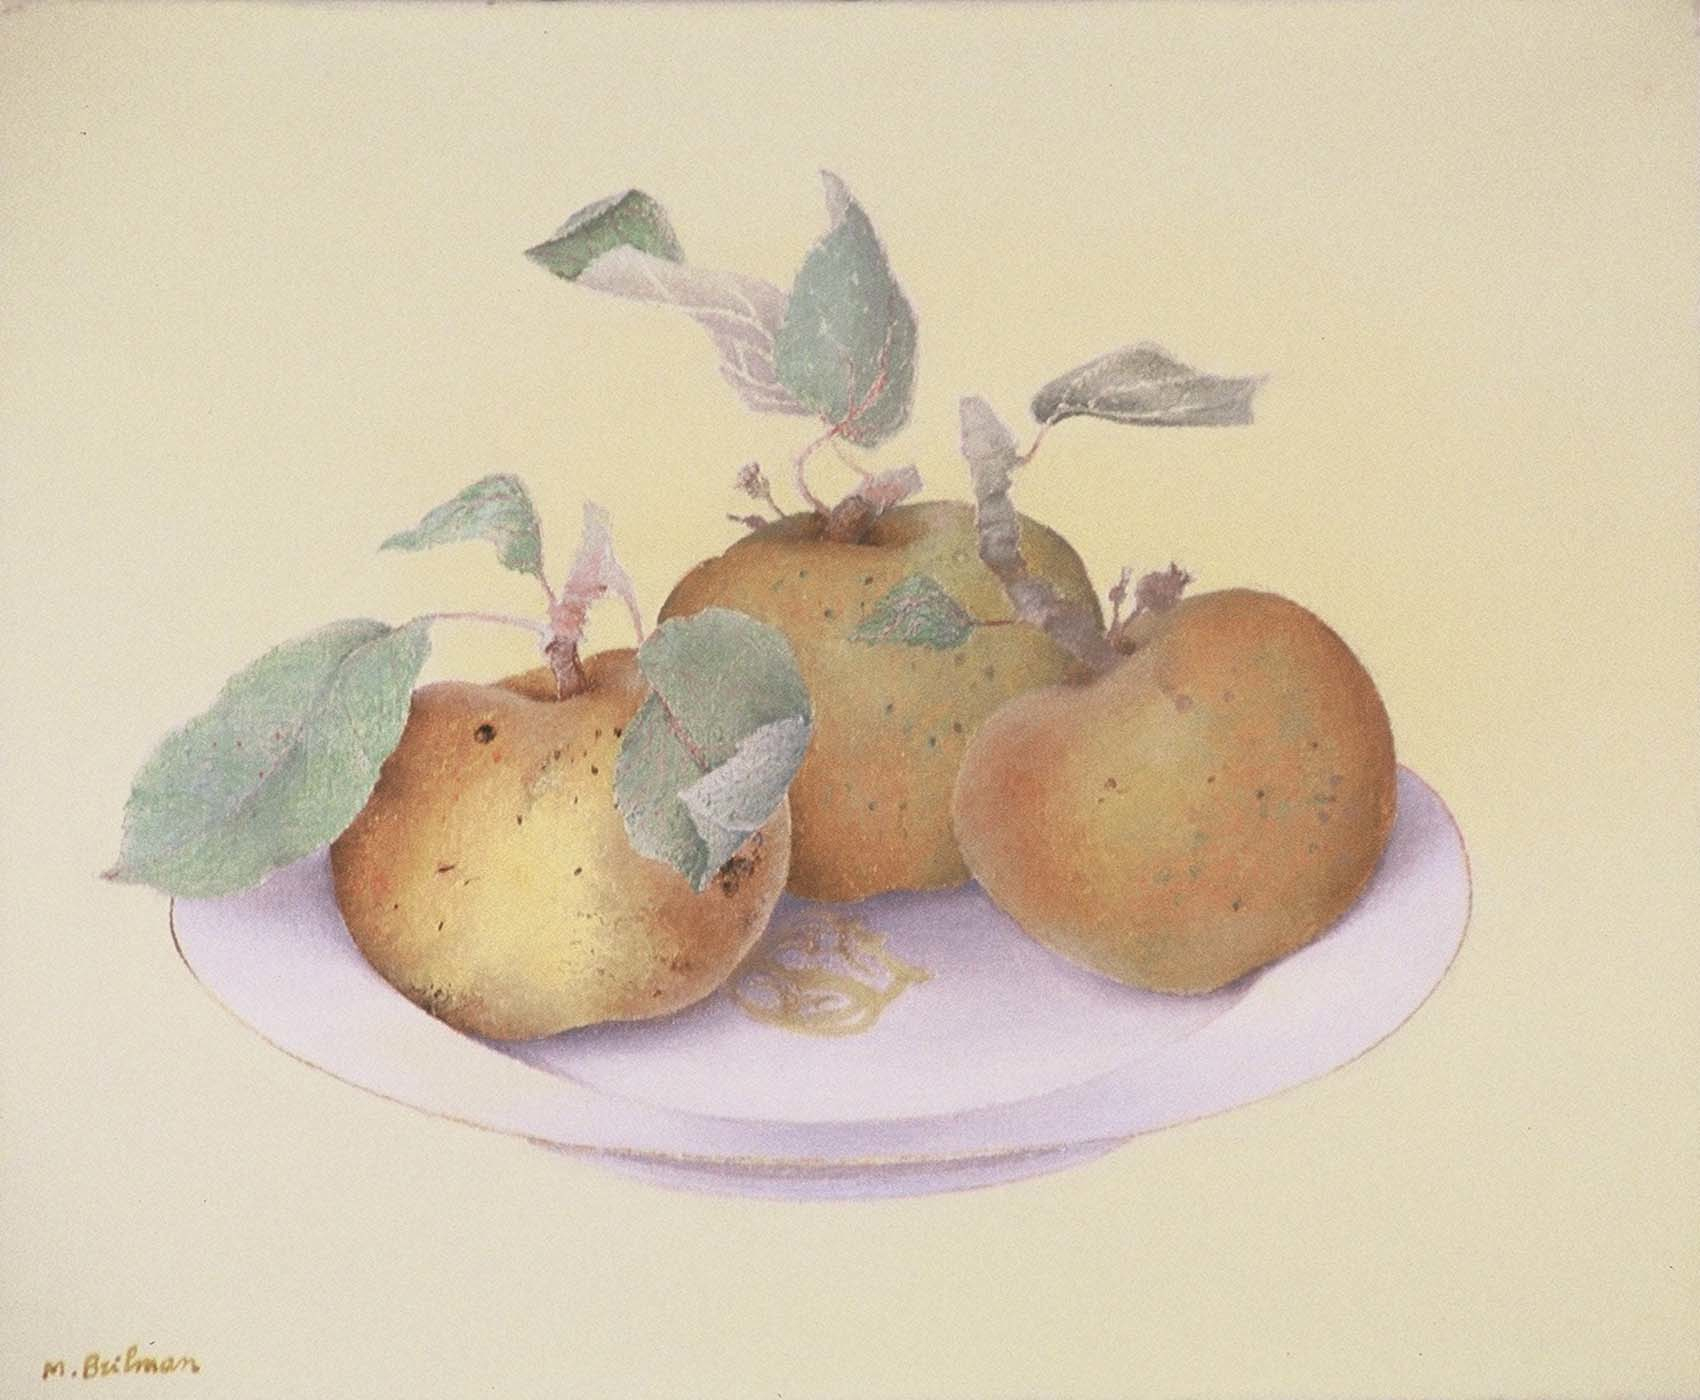 Pommes Canada grises